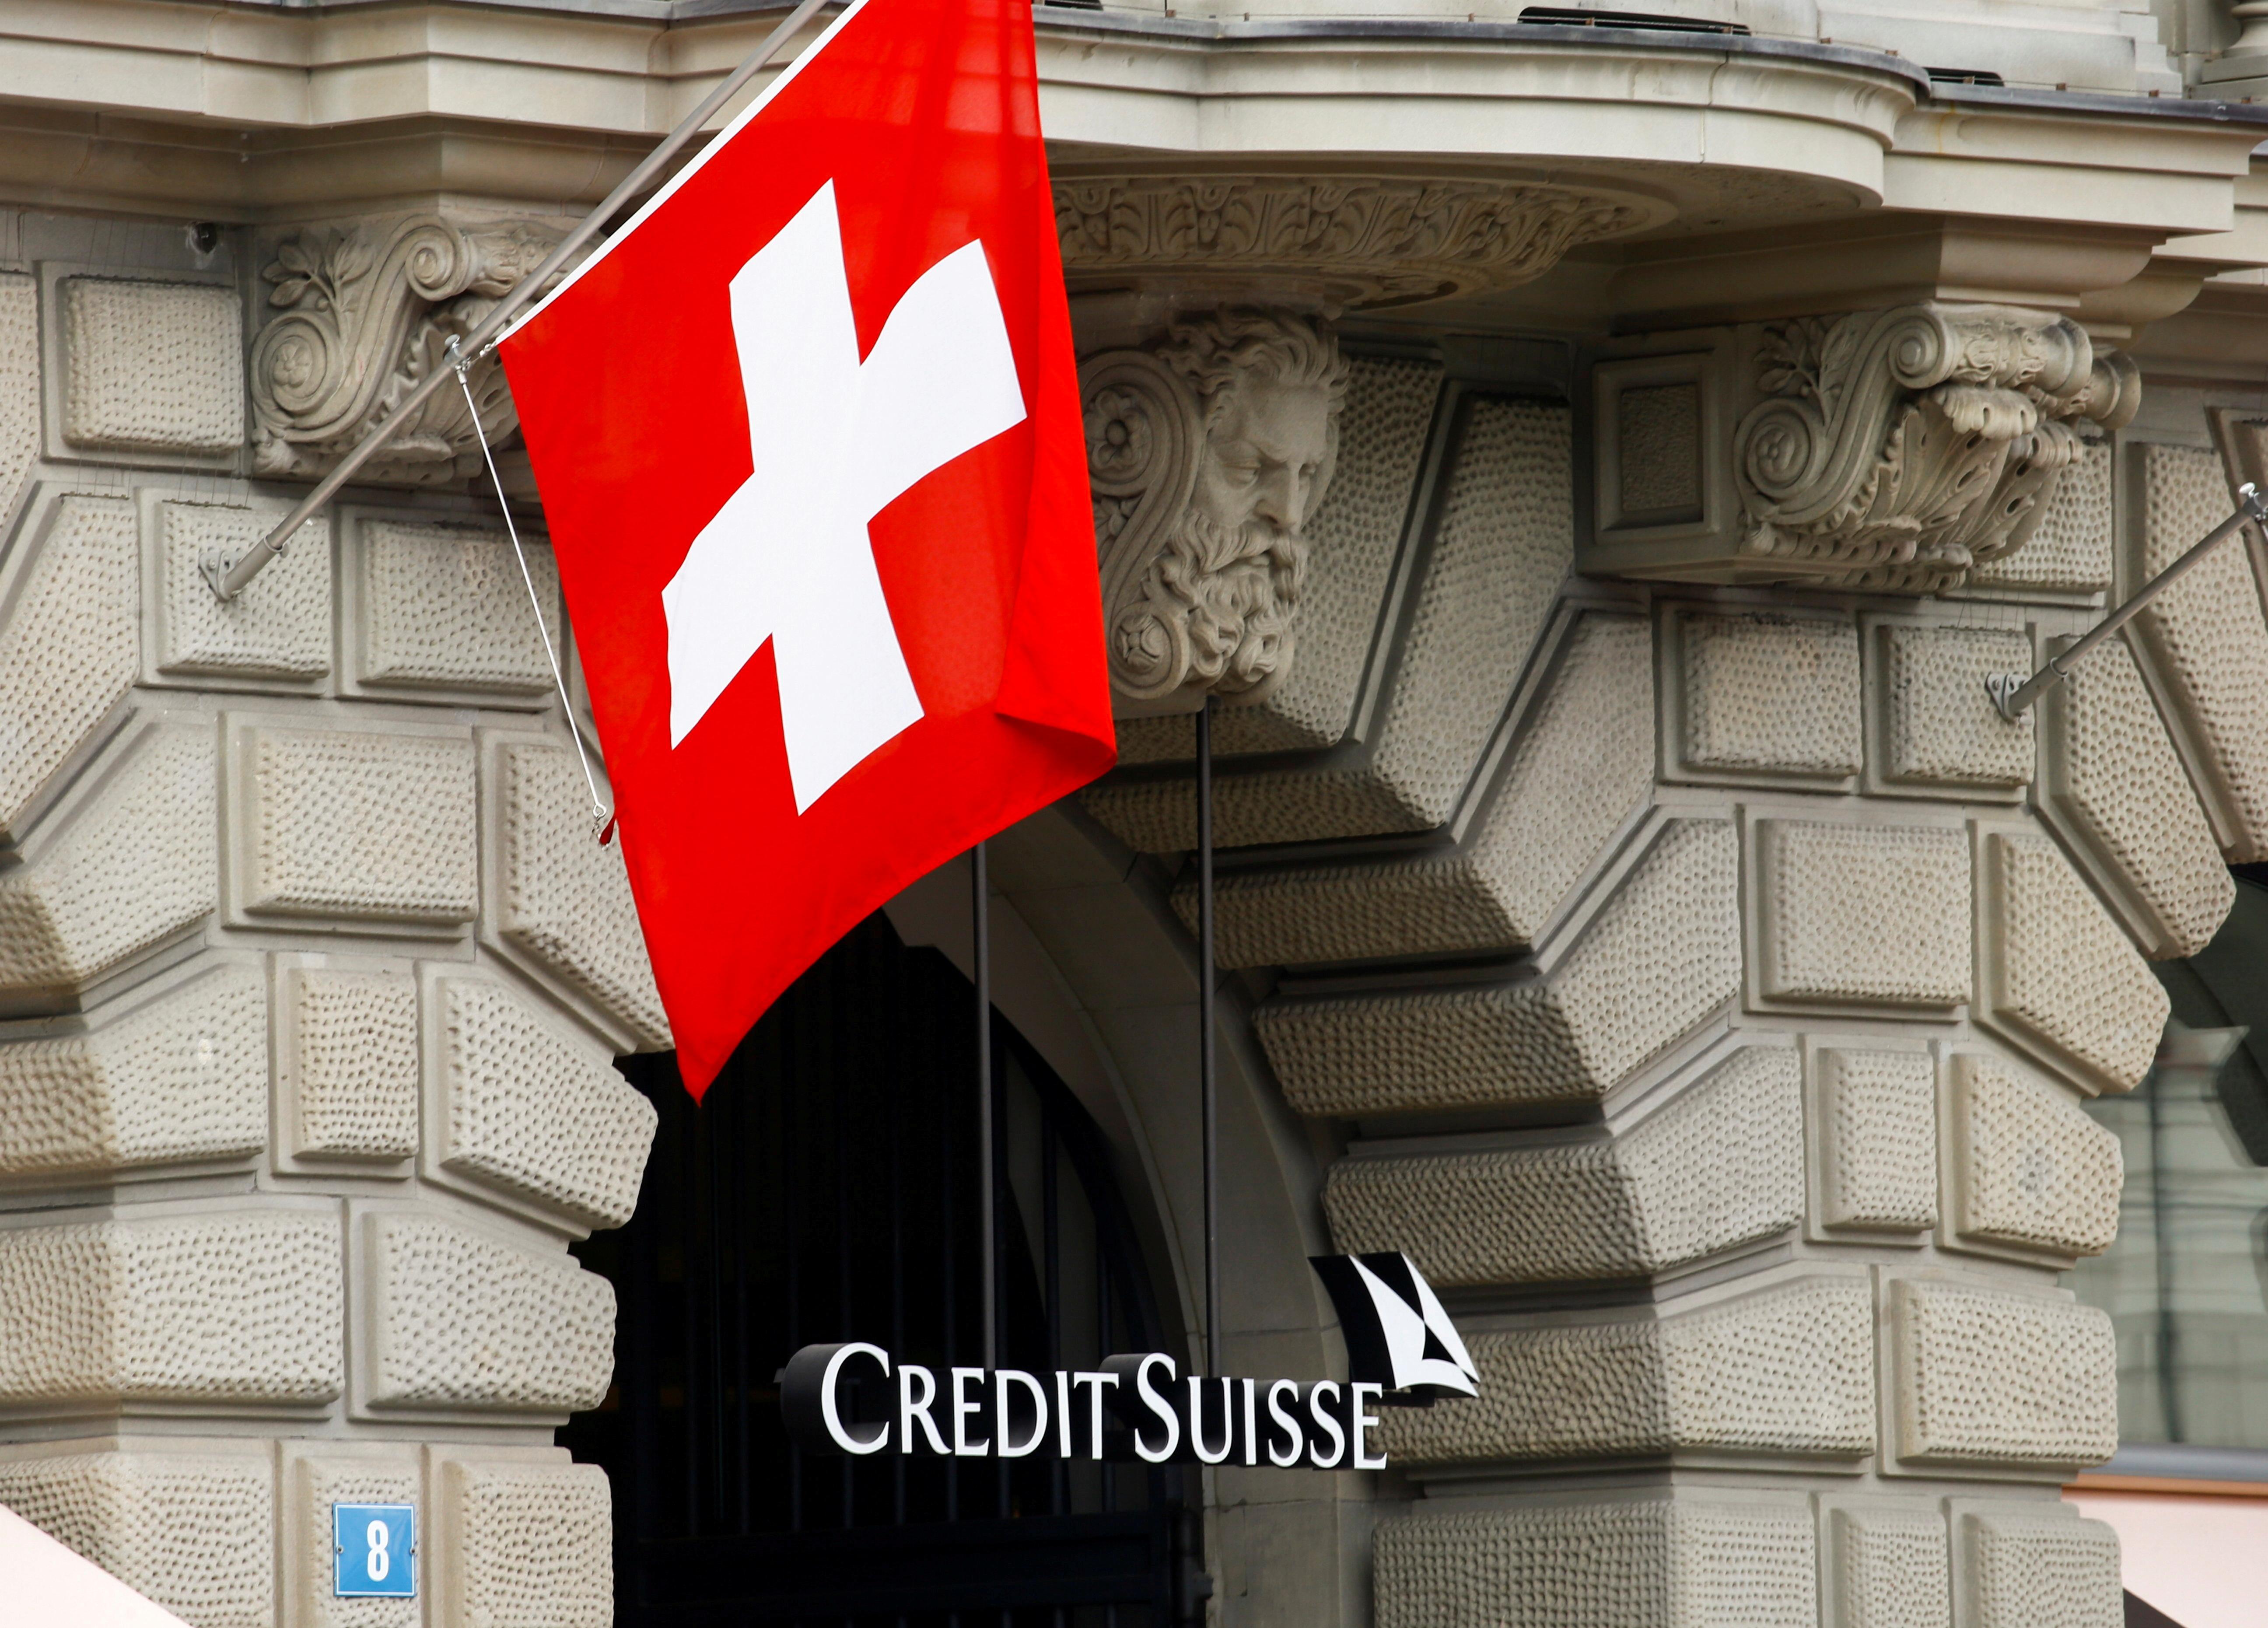 Switzerland's national flag flies above the logo of Swiss bank Credit Suisse at its headquarters in Zurich, Switzerland April 18, 2021. REUTERS/Arnd Wiegmann/File Photo